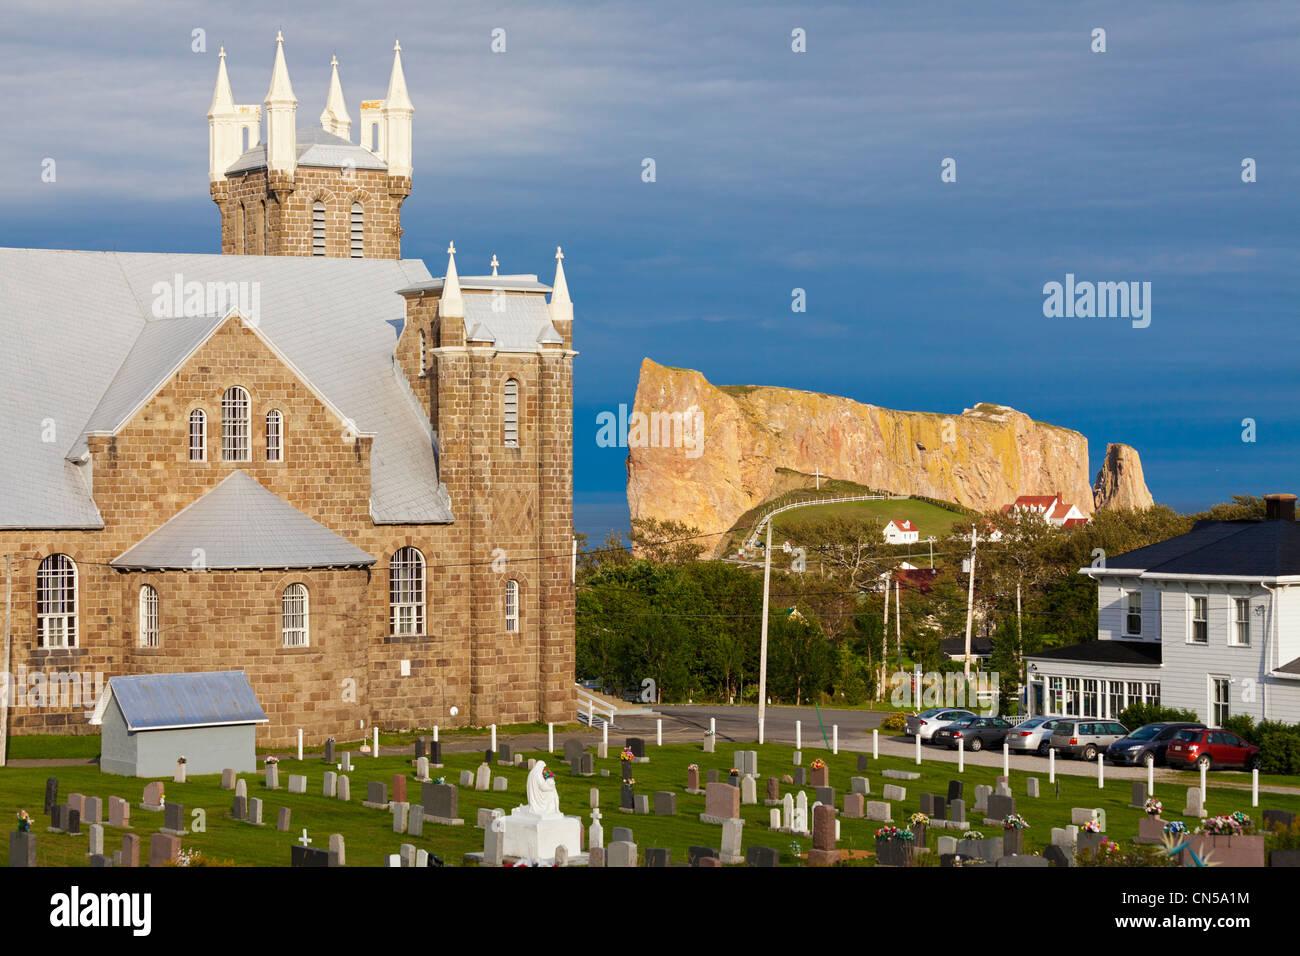 Canada, Quebec Province, Gaspe Peninsula, Perce and its famous Rocher Perce (Perce Rock), St Michel church - Stock Image